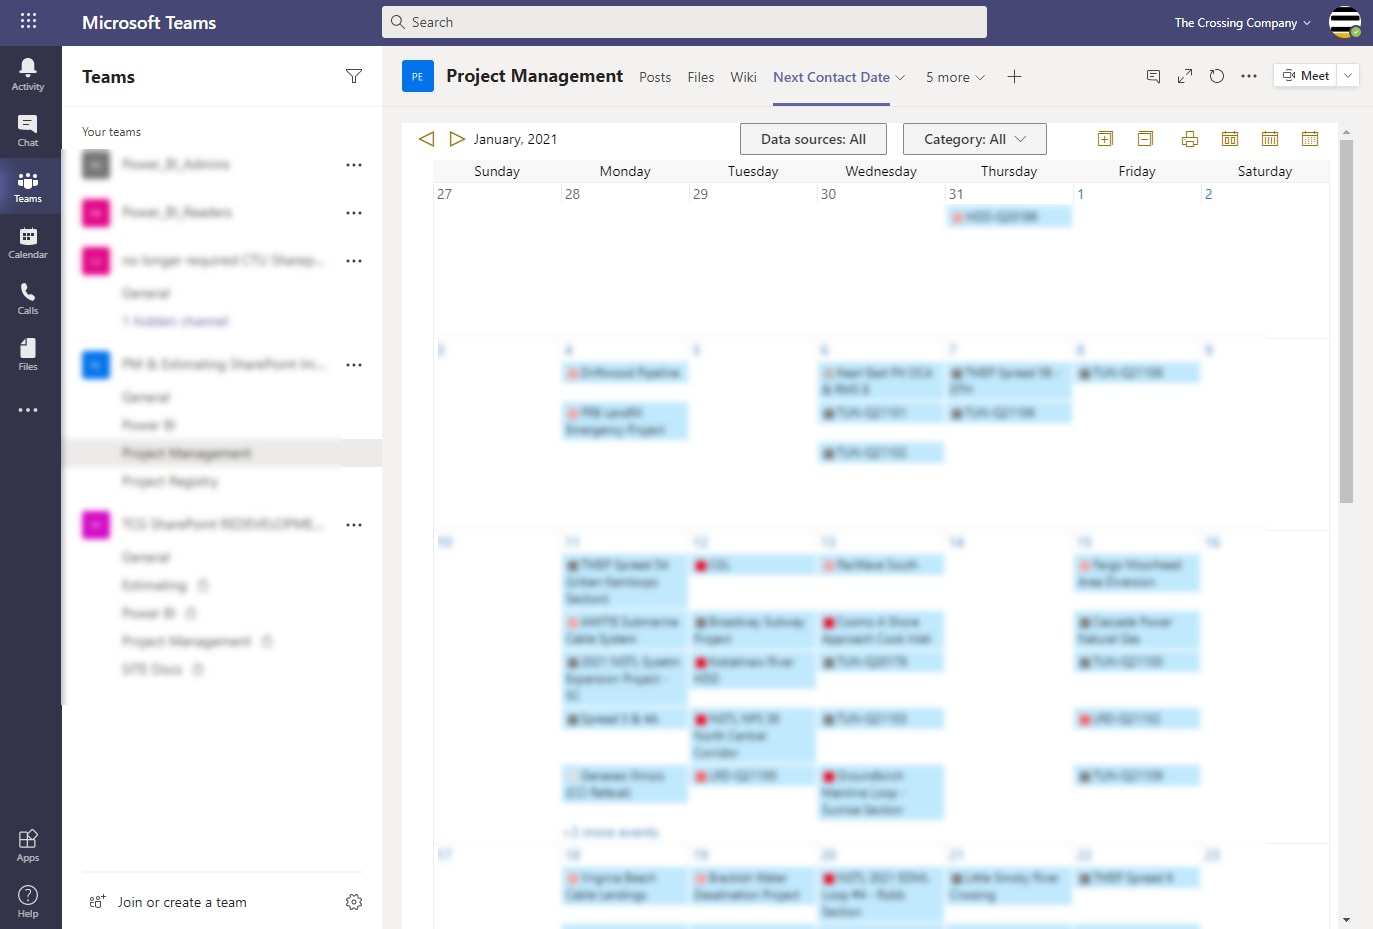 Microsoft Teams Calendar App